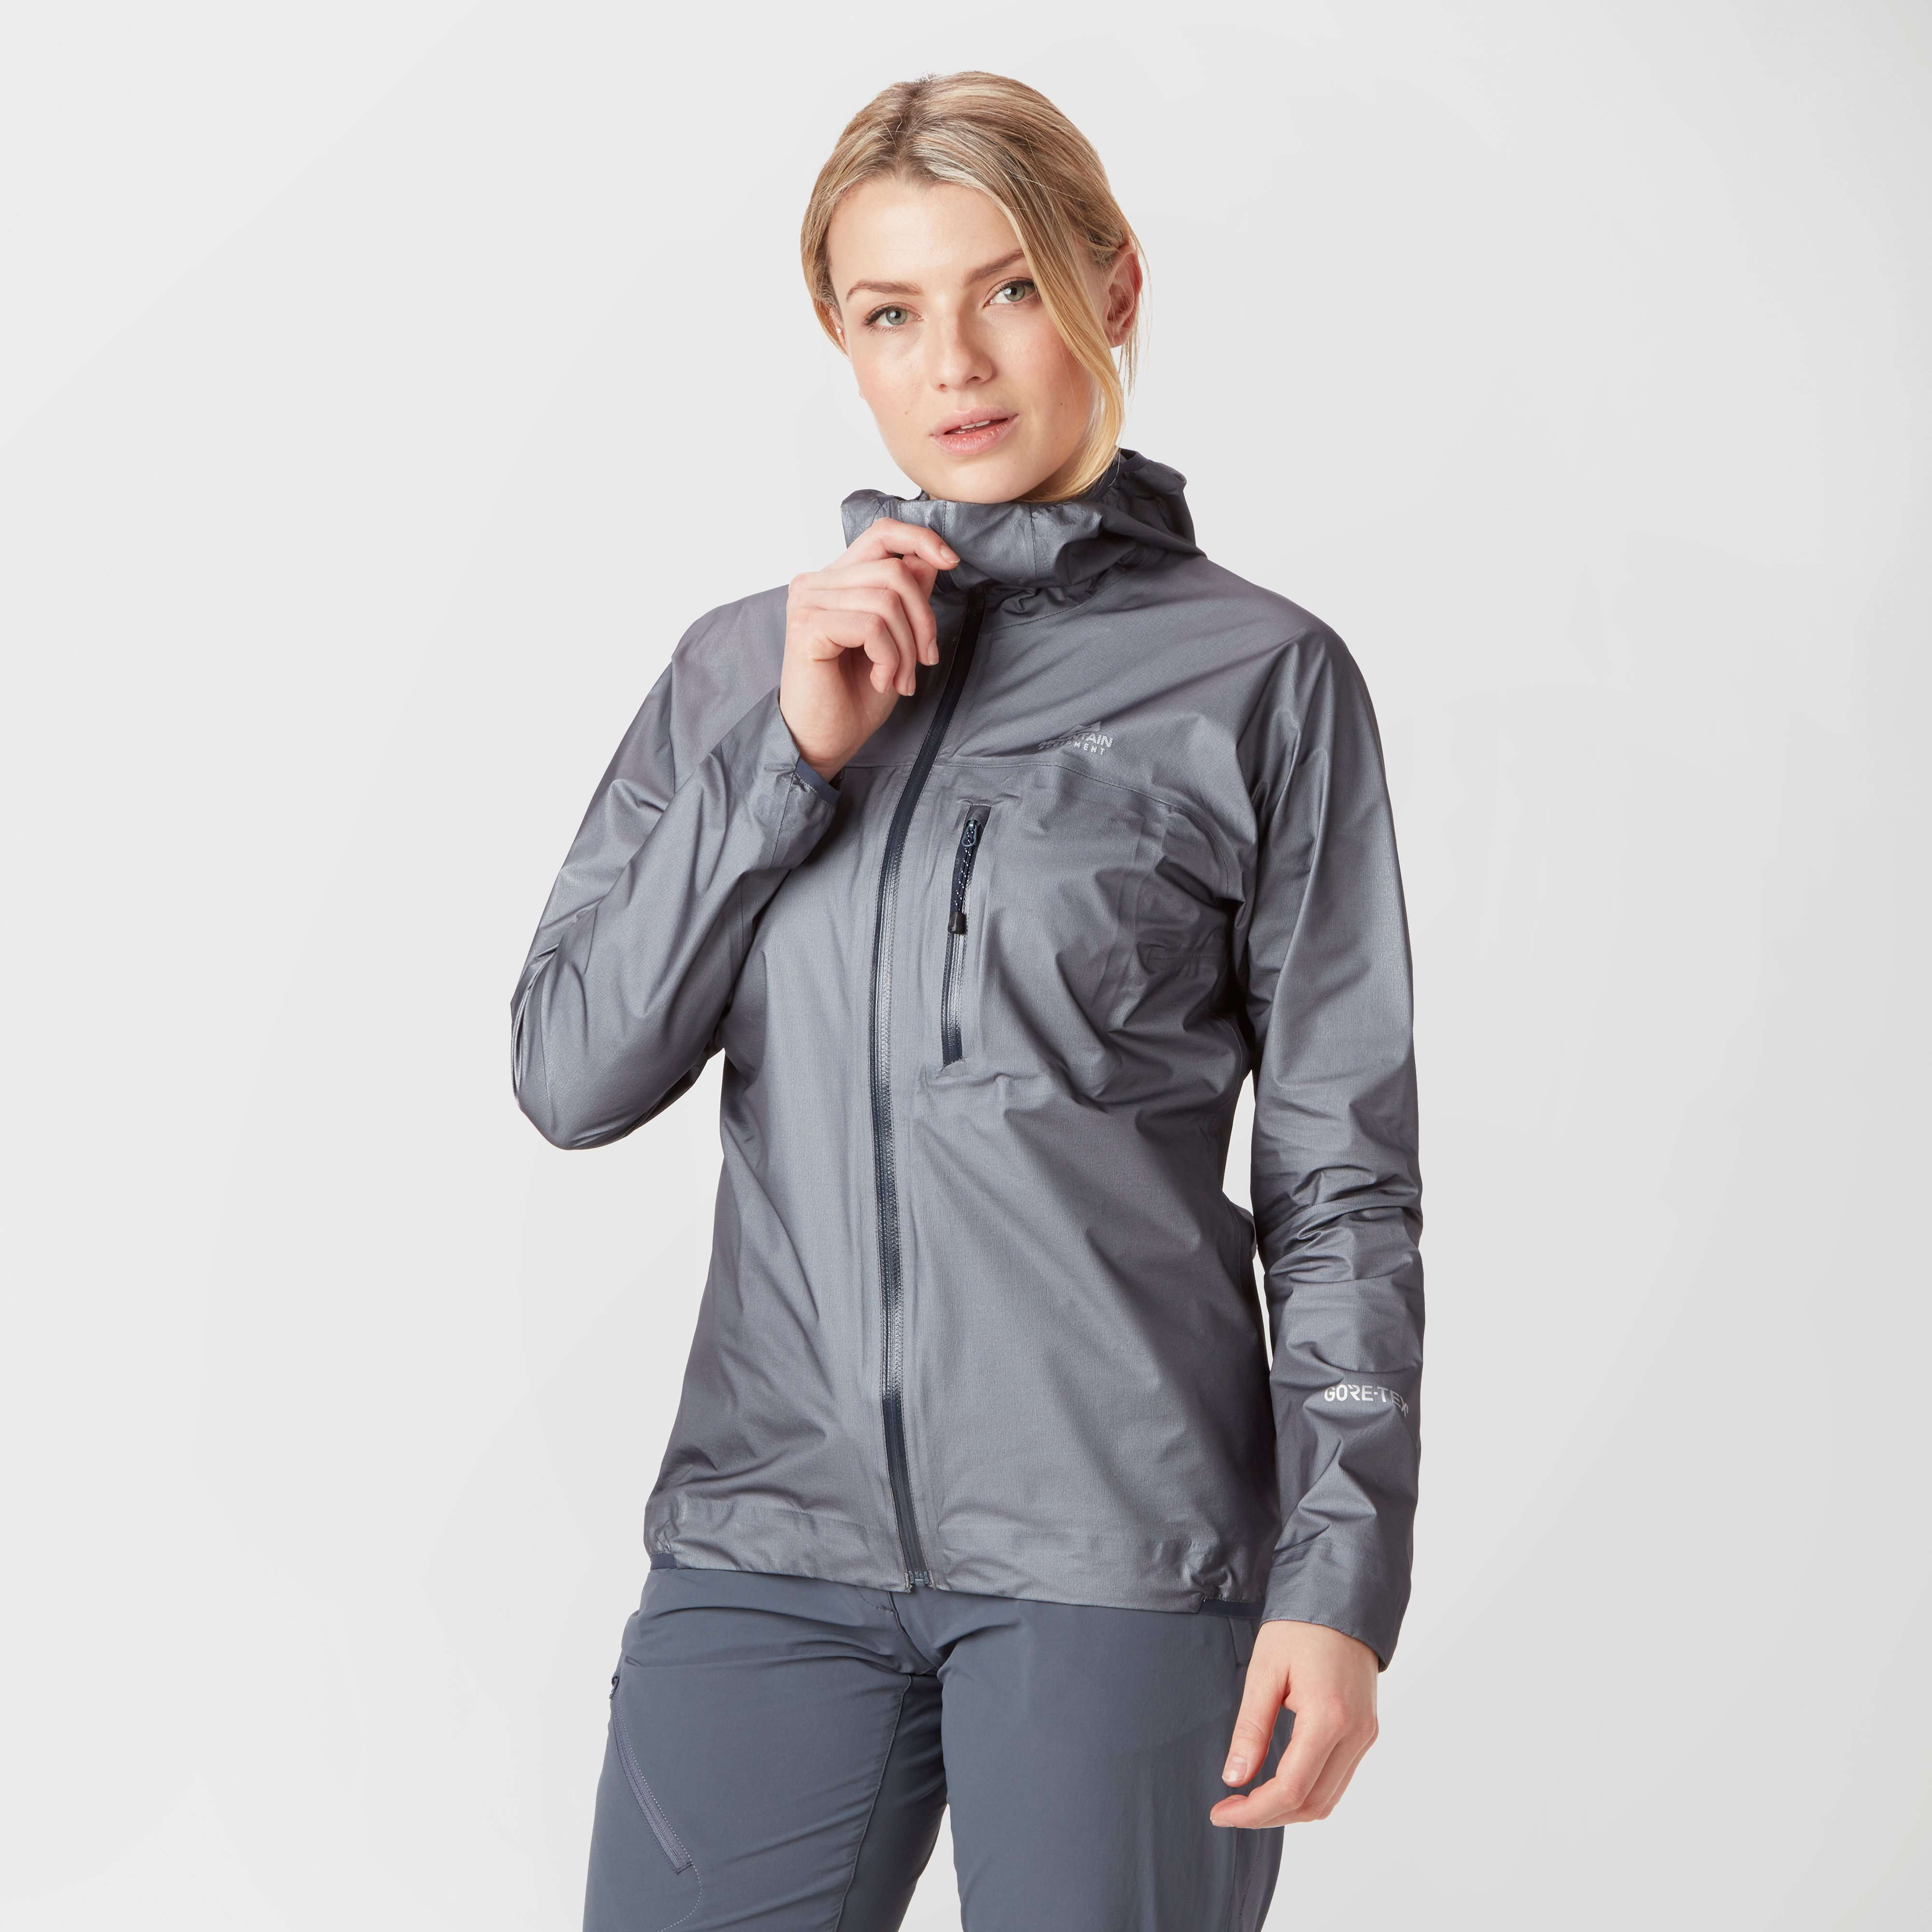 MOUNTAIN EQUIPMENT Women's Impellor Jacket